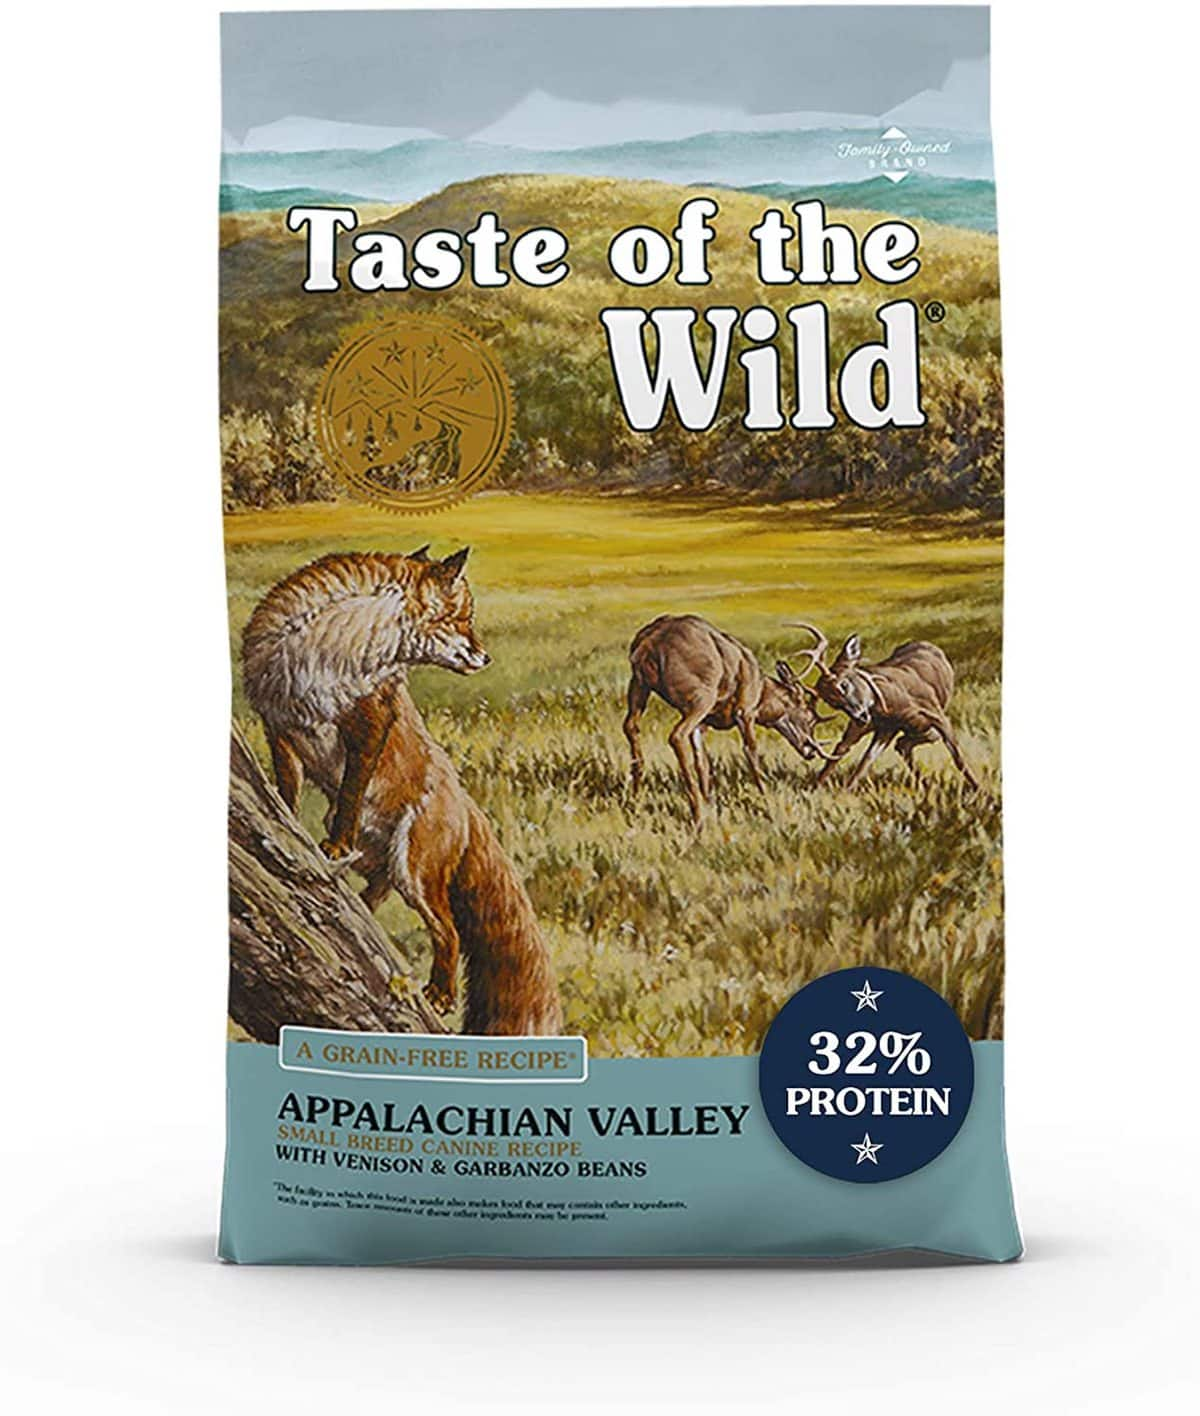 Taste of the Wild, Appalachian Valley Small Breed Formula